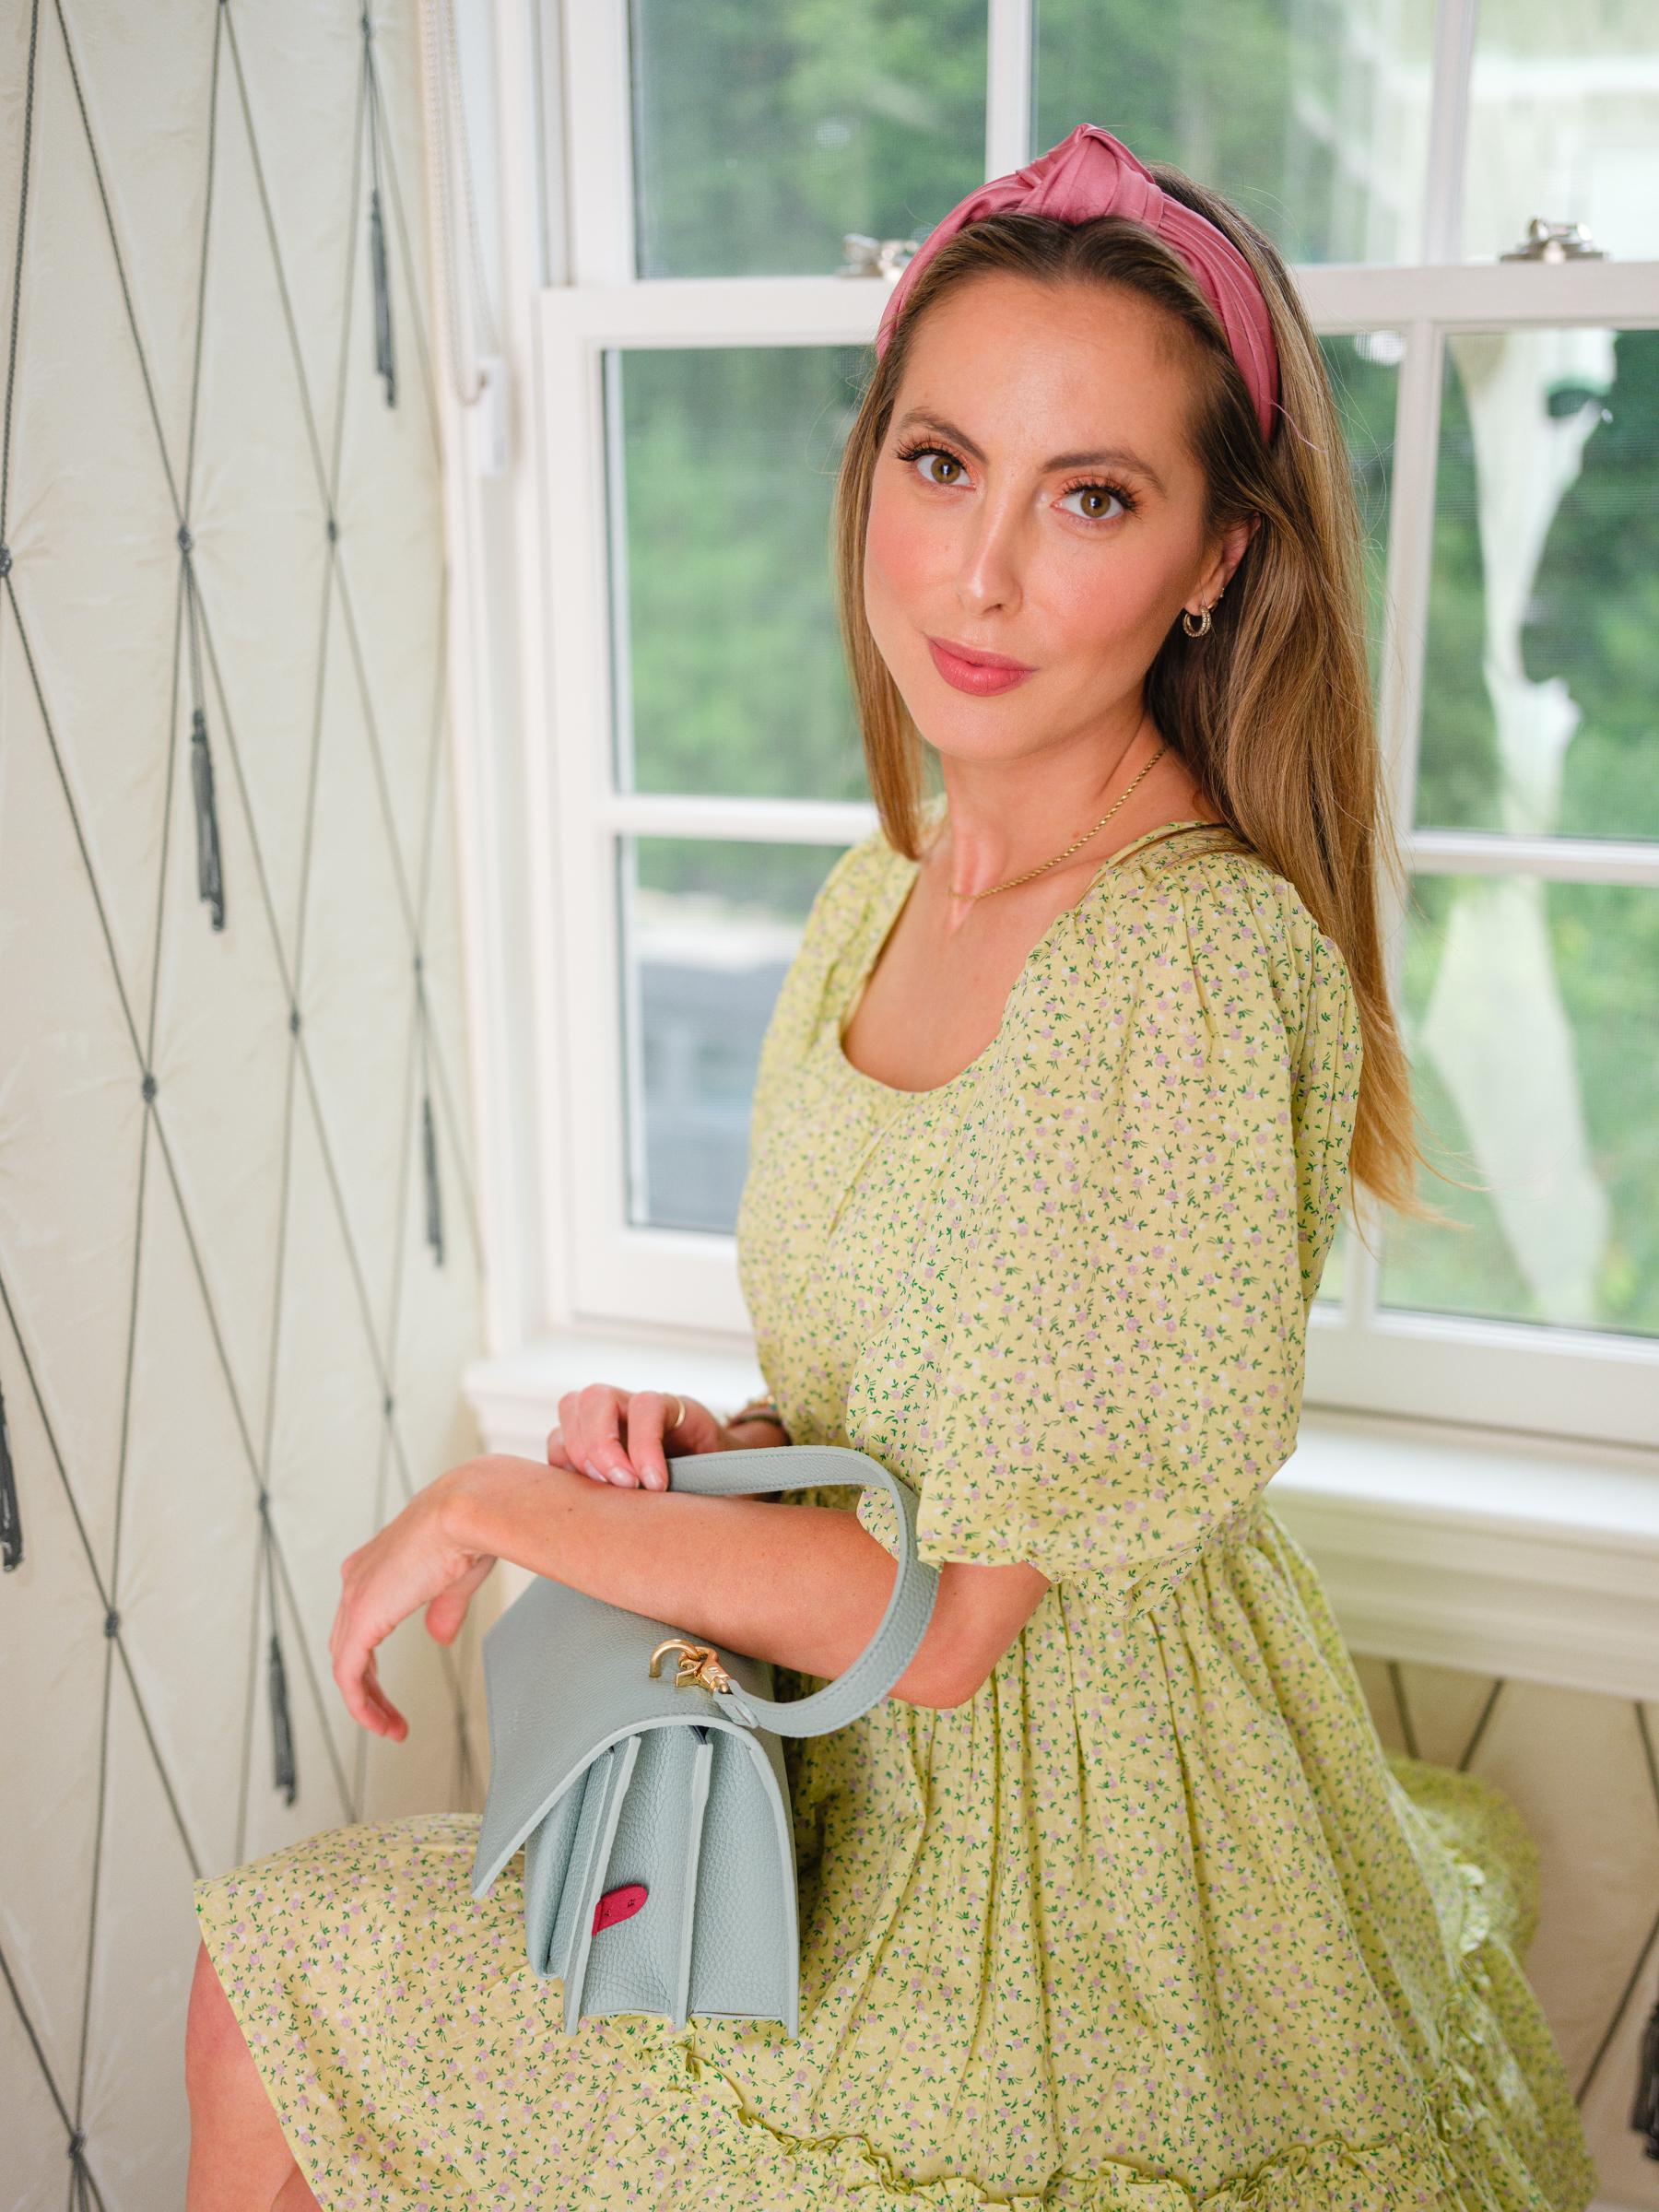 Eva Amurri shares her favorite romantic summer style